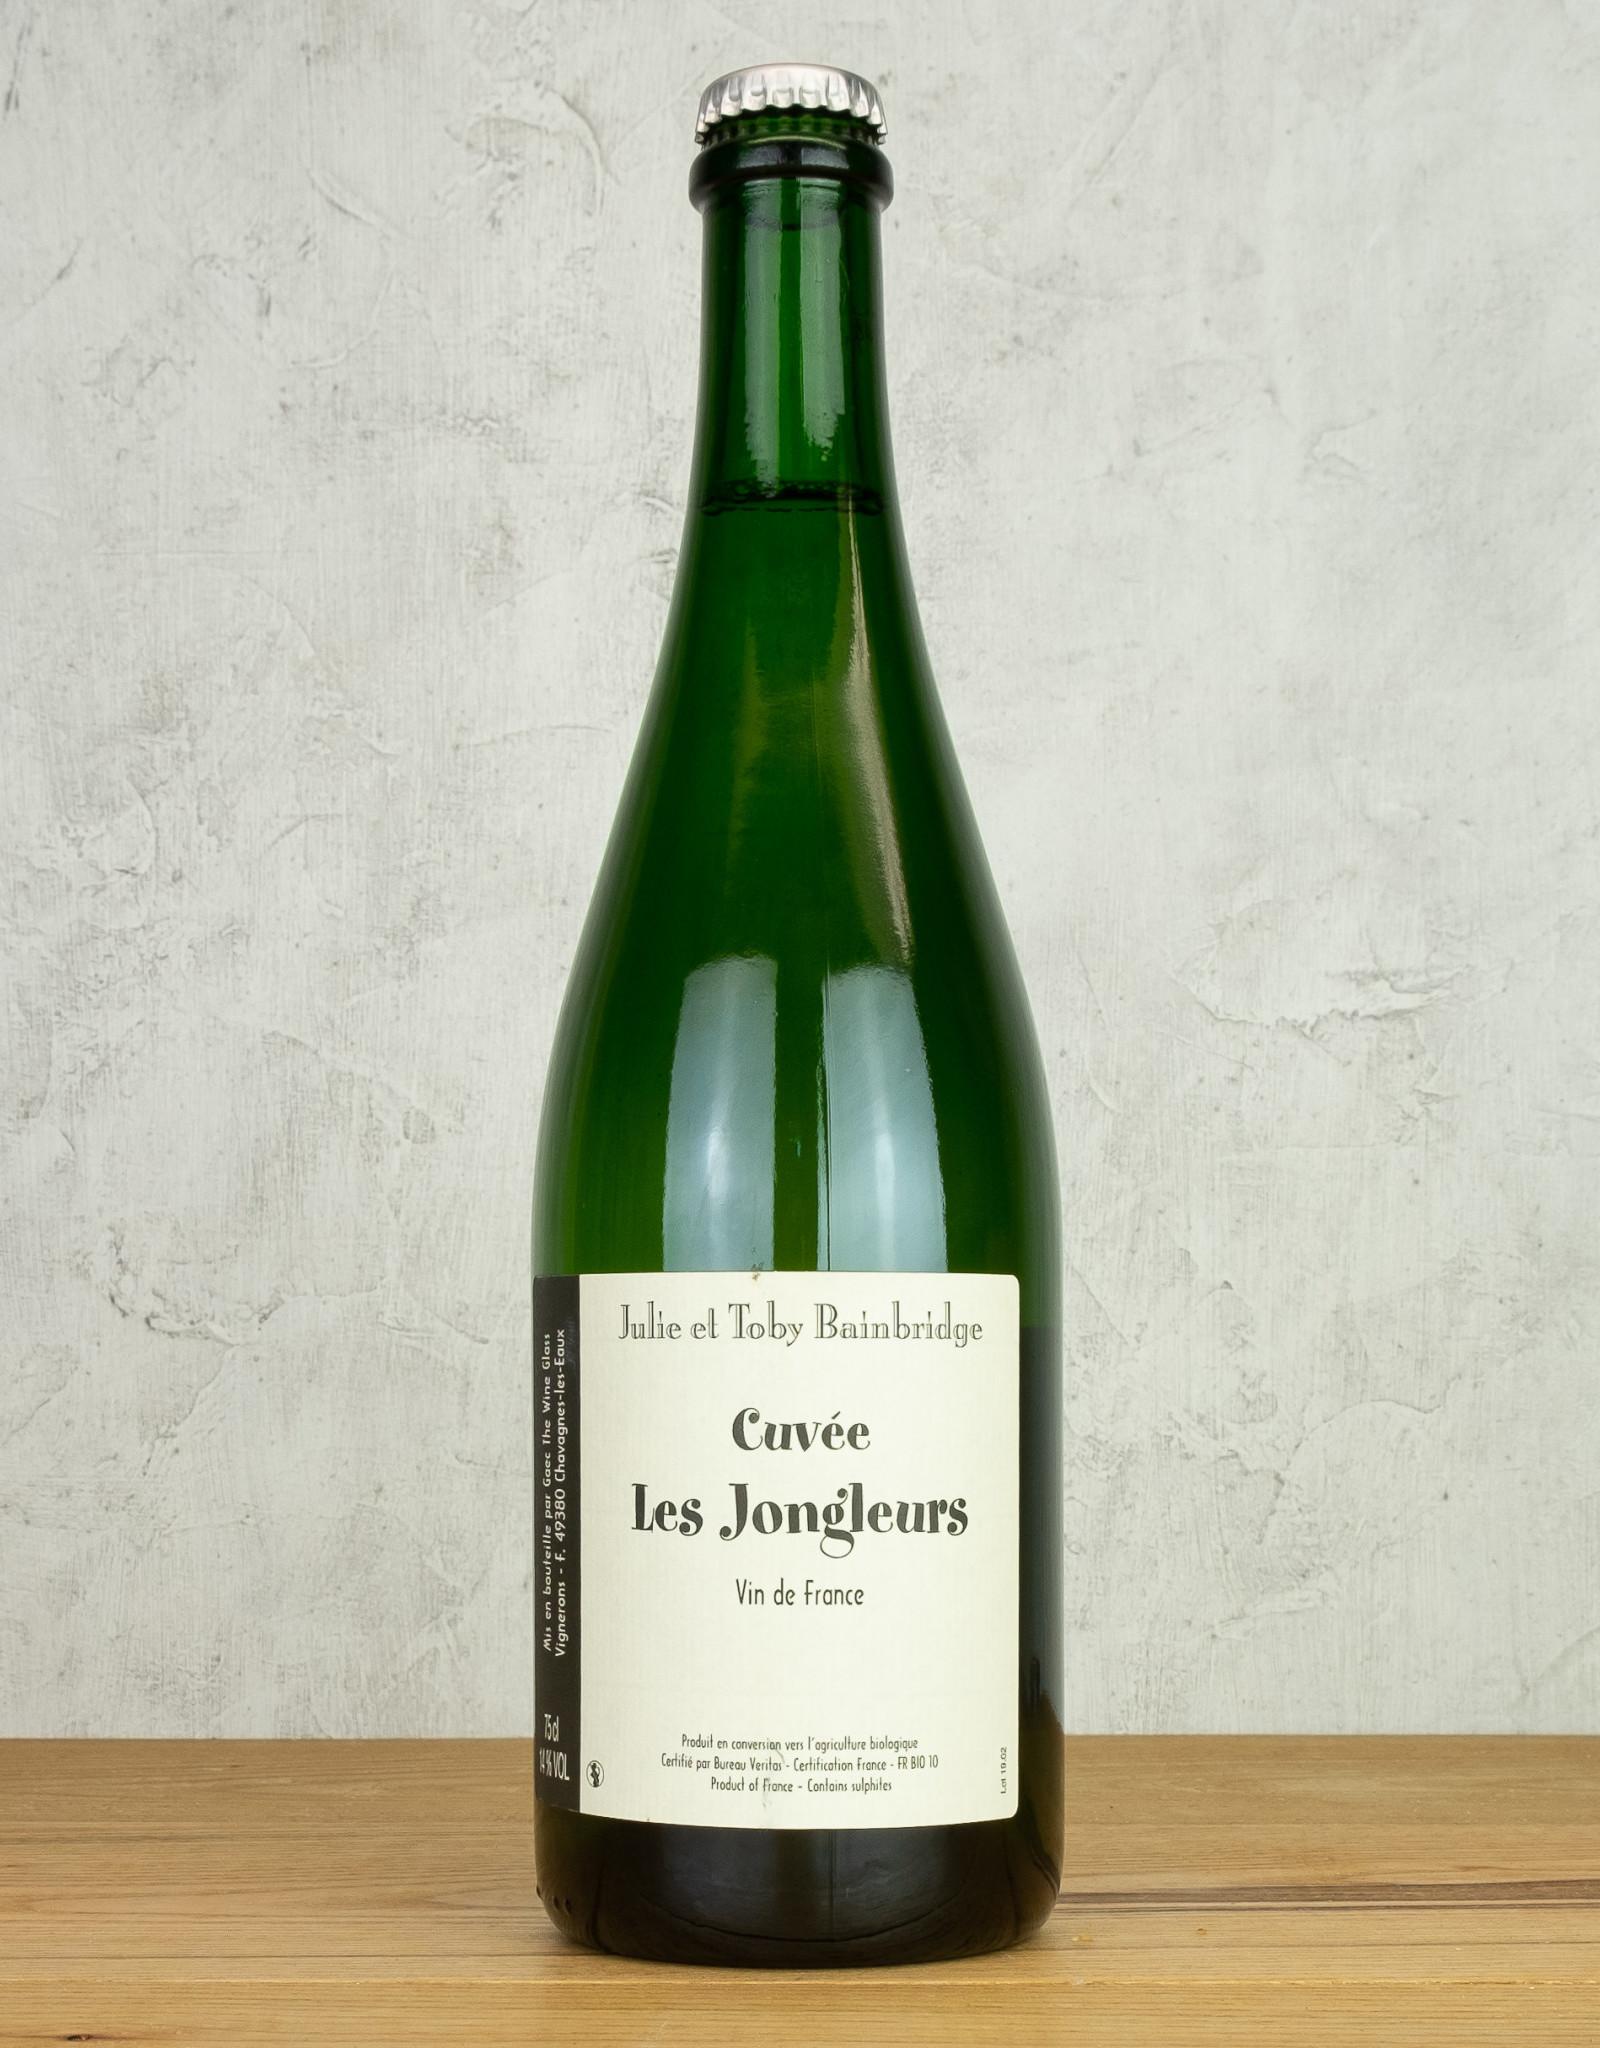 Bainbridge & Cathcart Cuvee Les Jongleurs